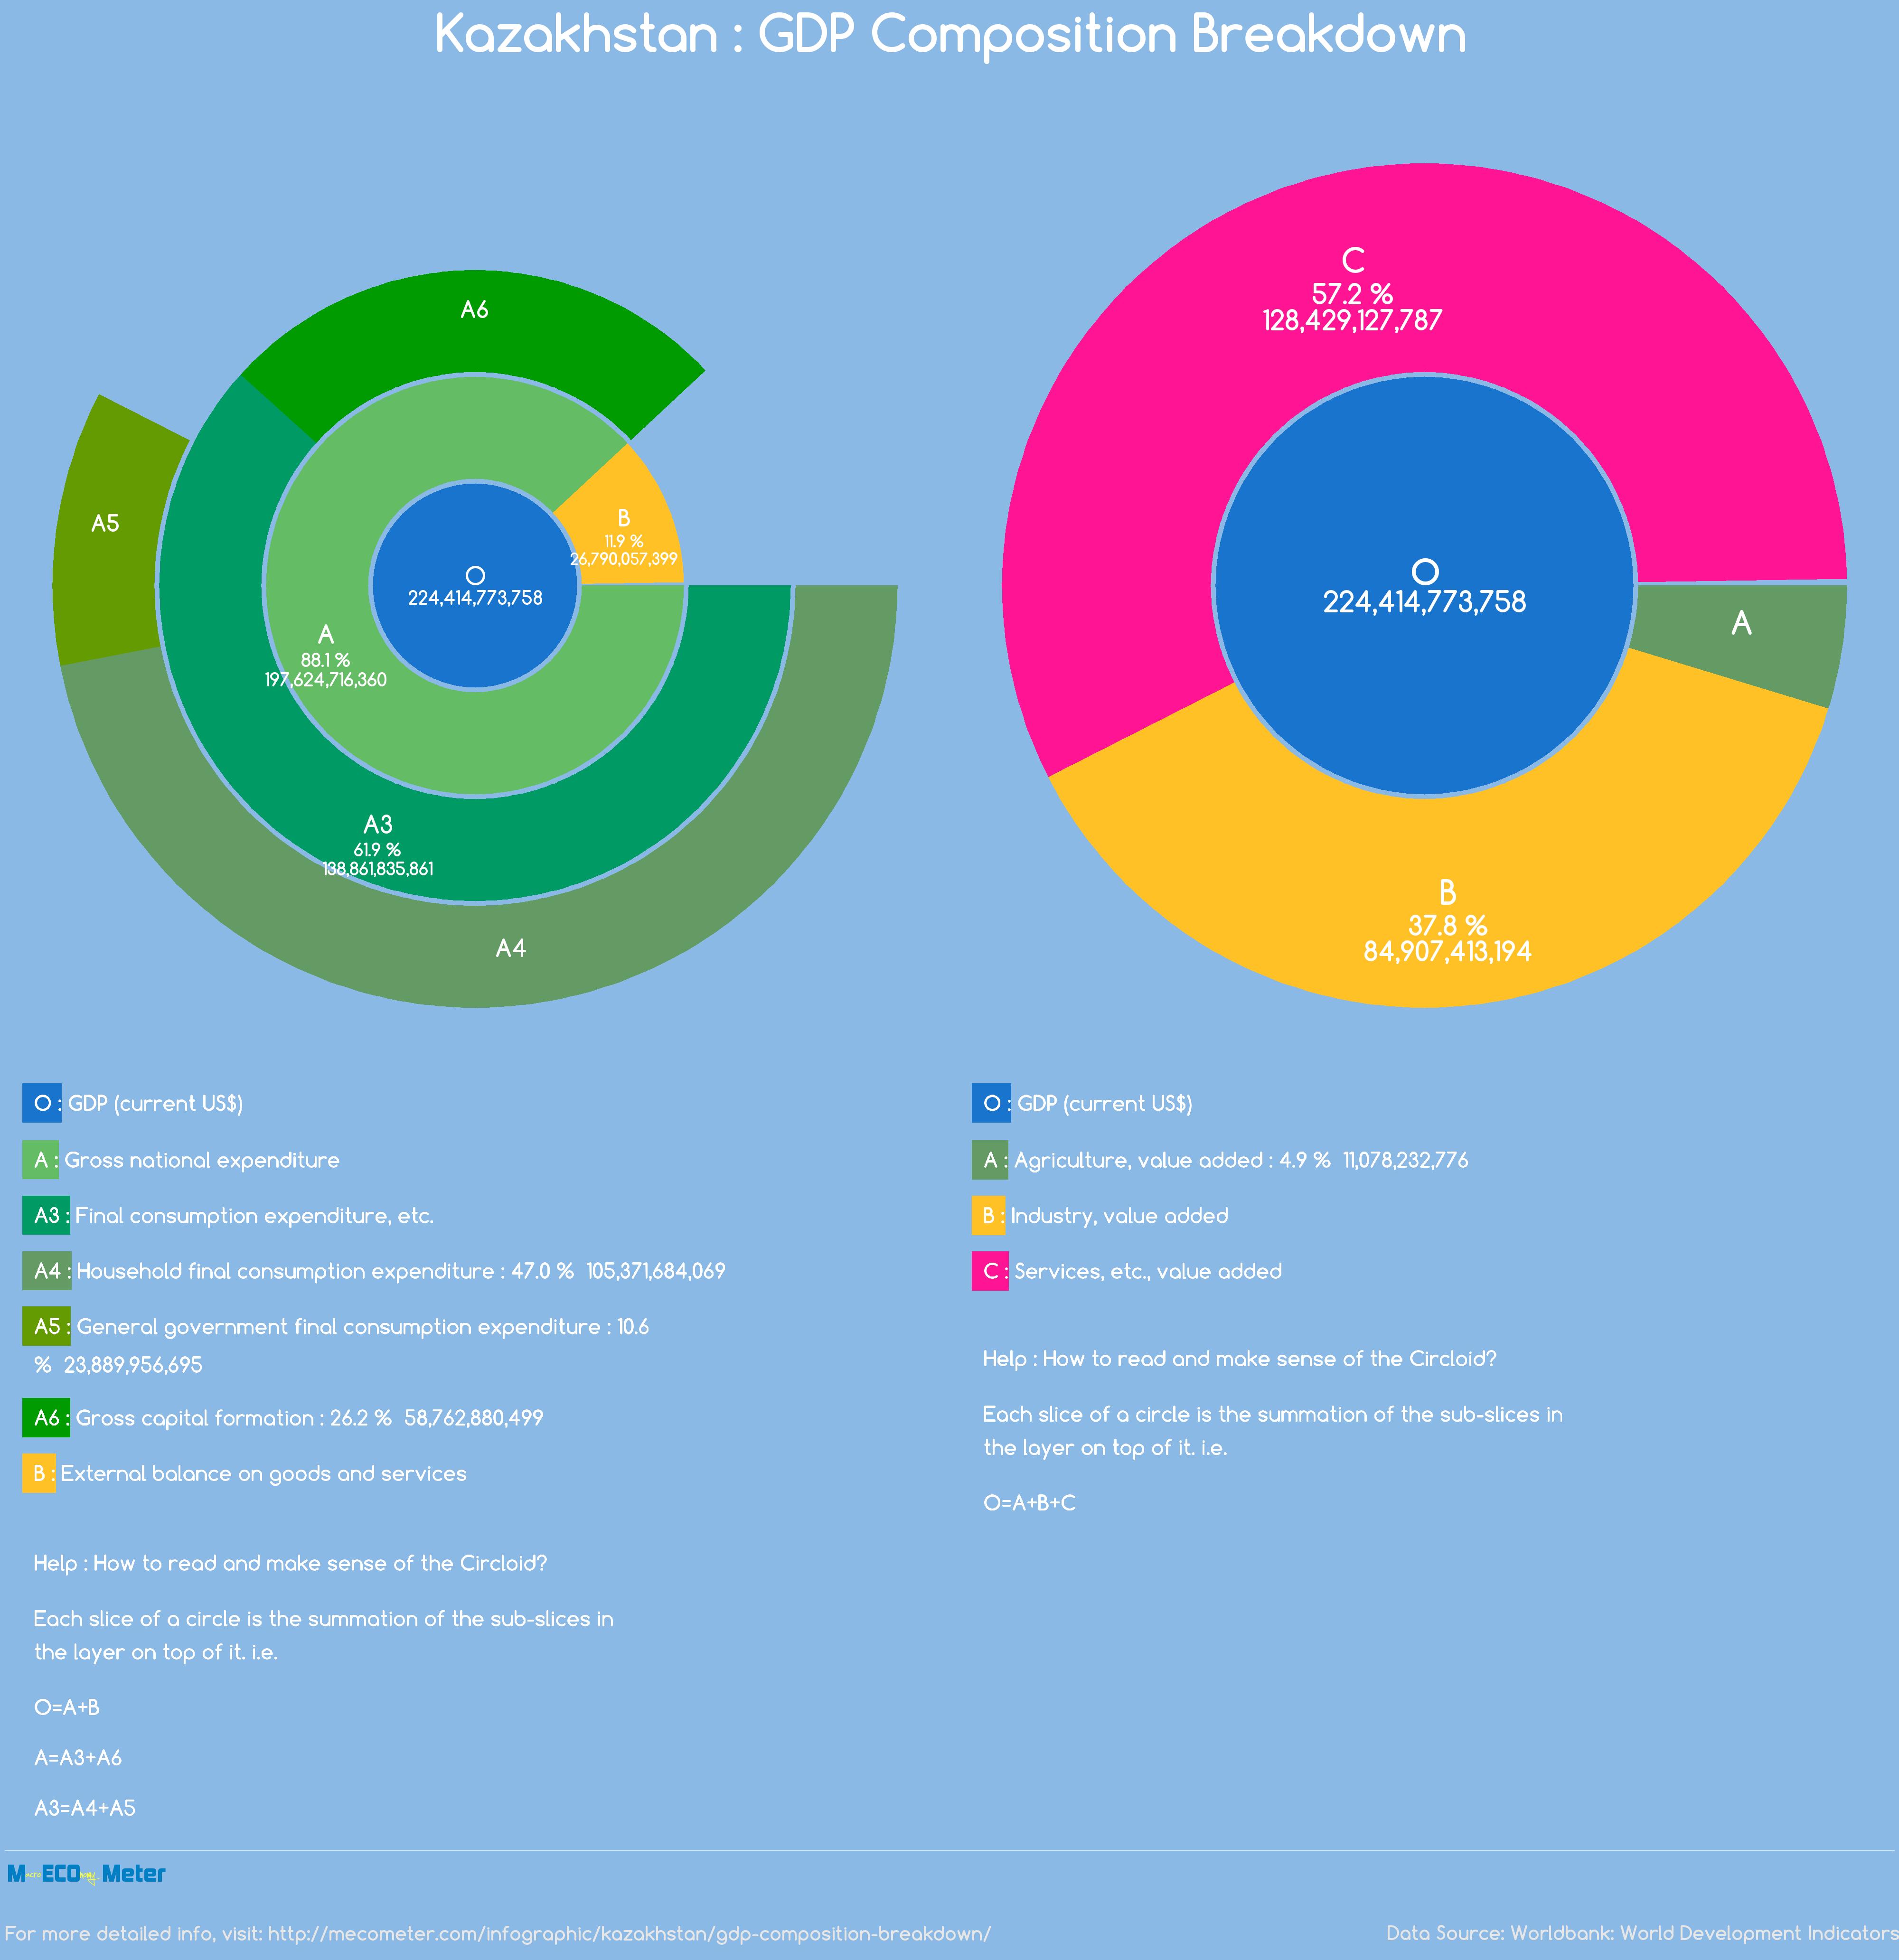 Kazakhstan : GDP Composition Breakdown